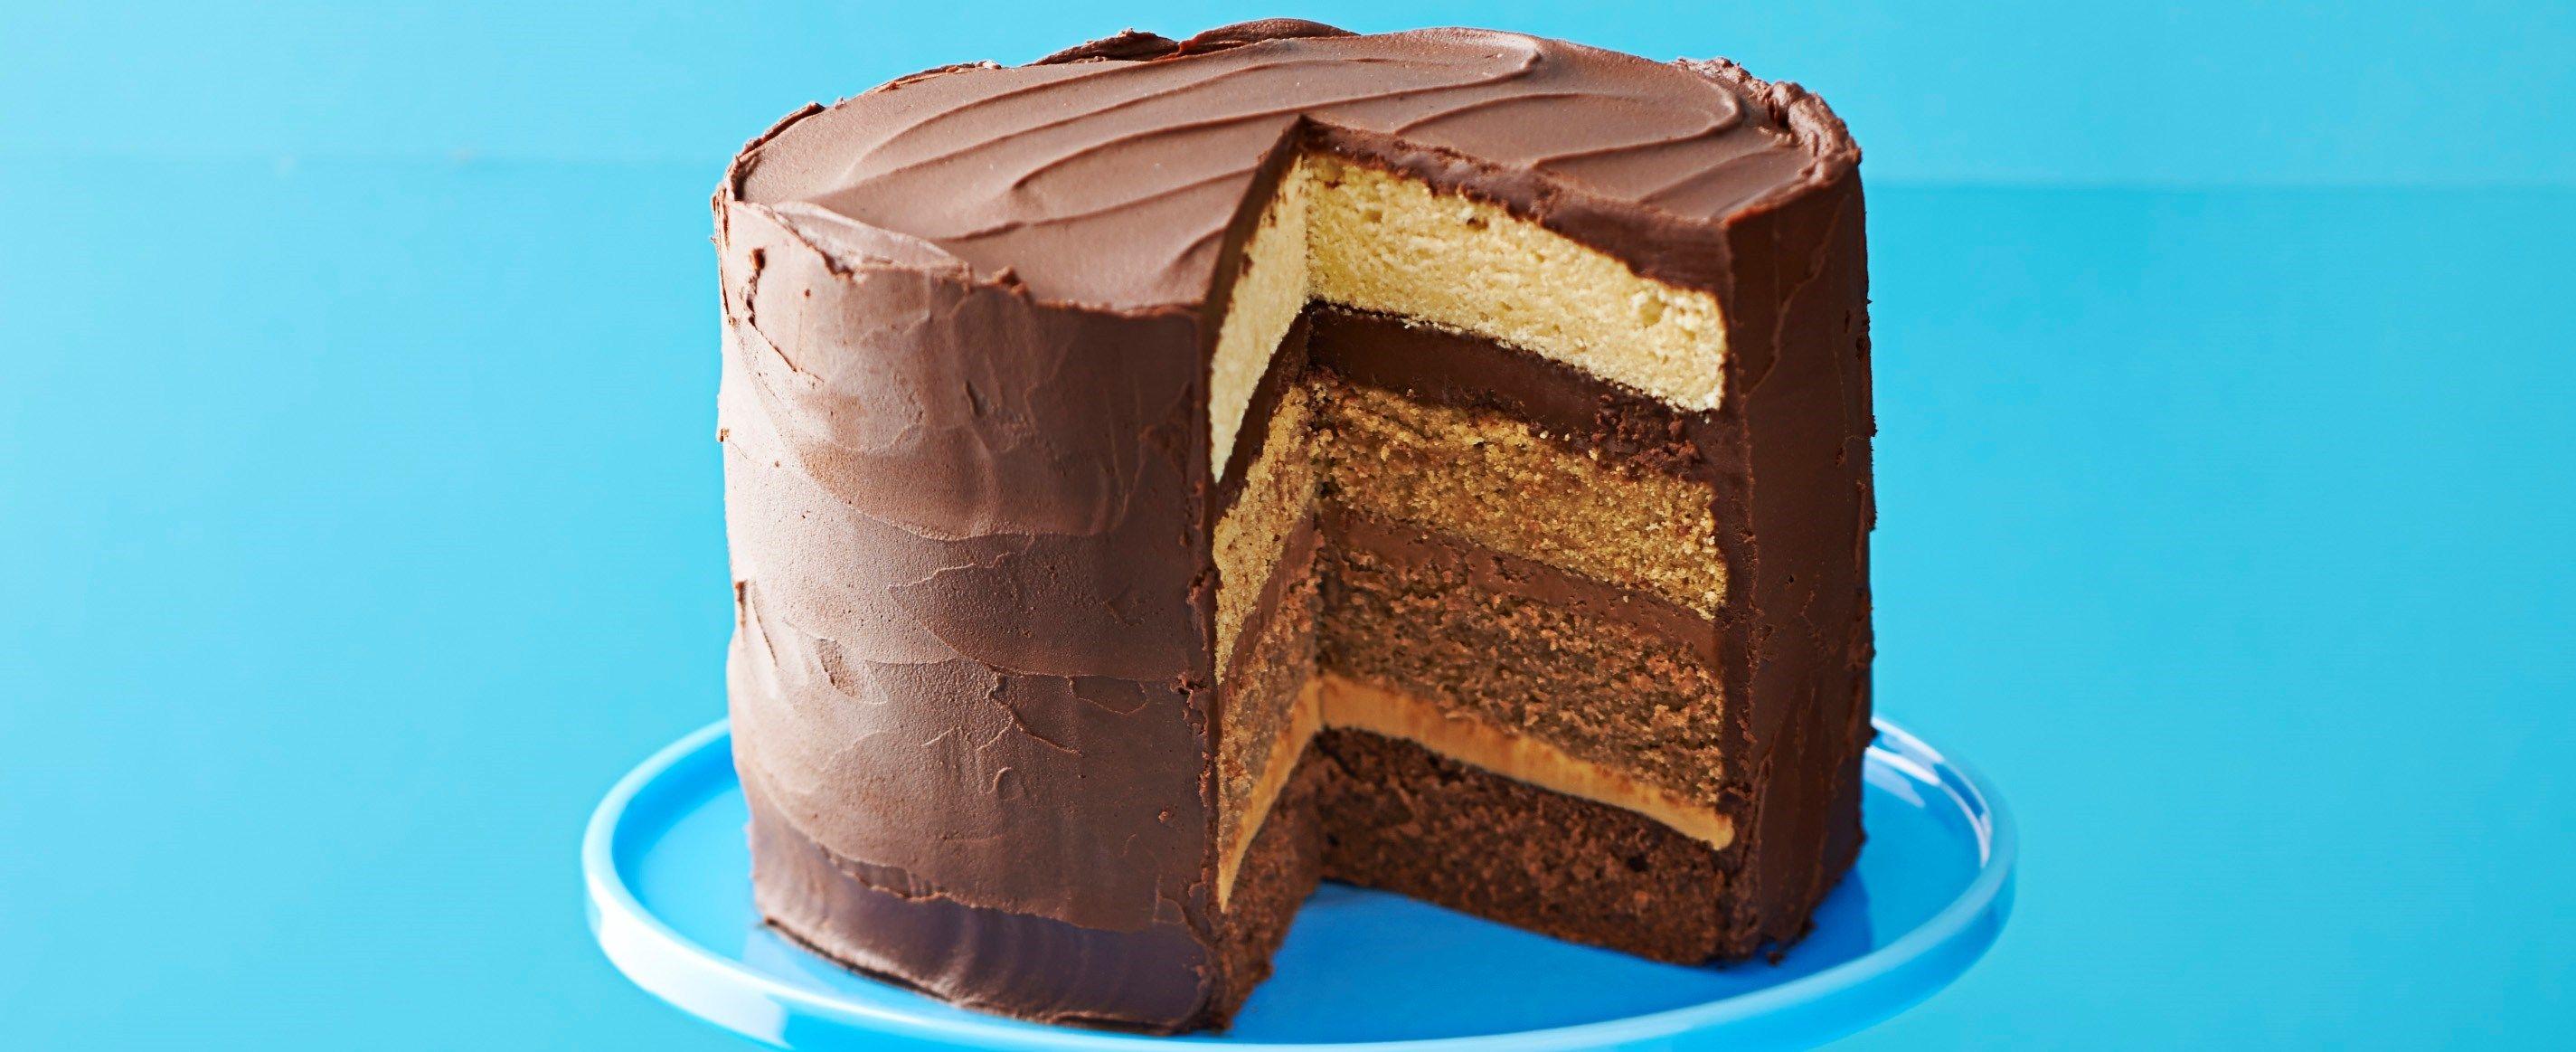 18 Best Chocolate Cake Recipes